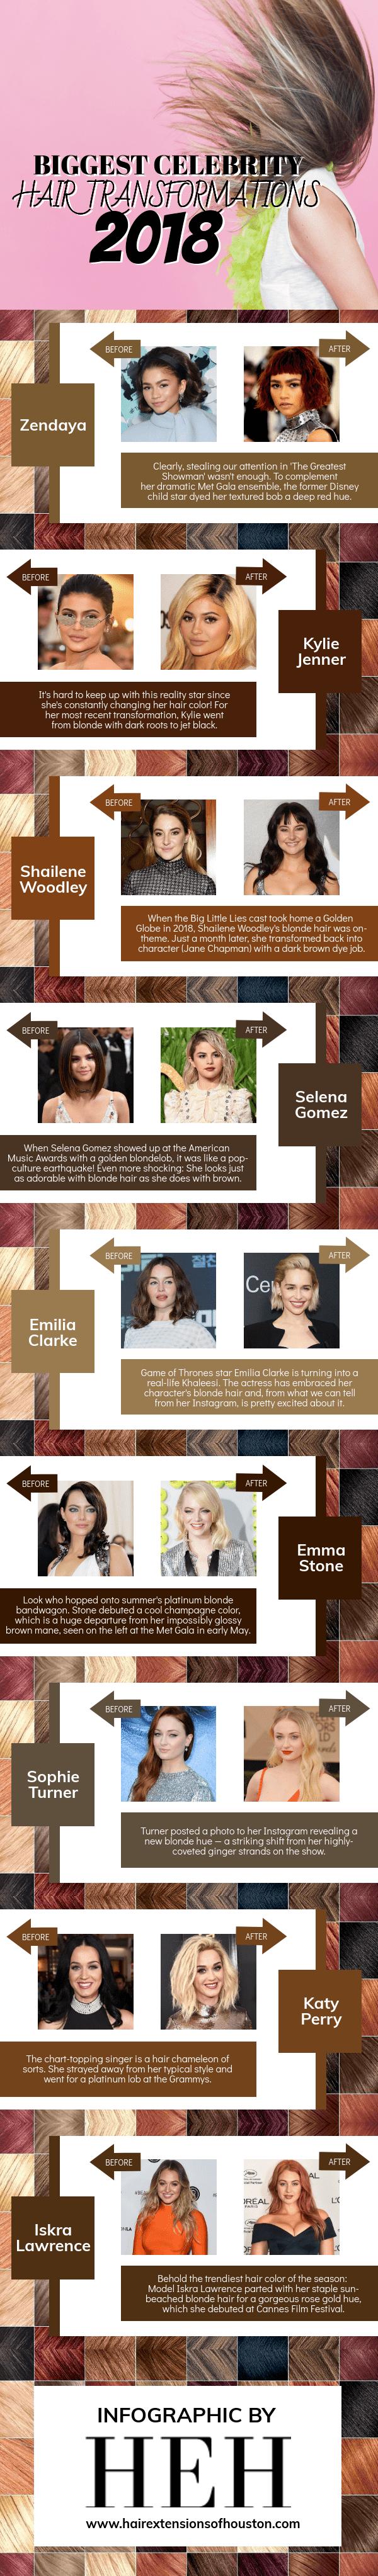 Biggest Celebrity Hair Transformations 2018